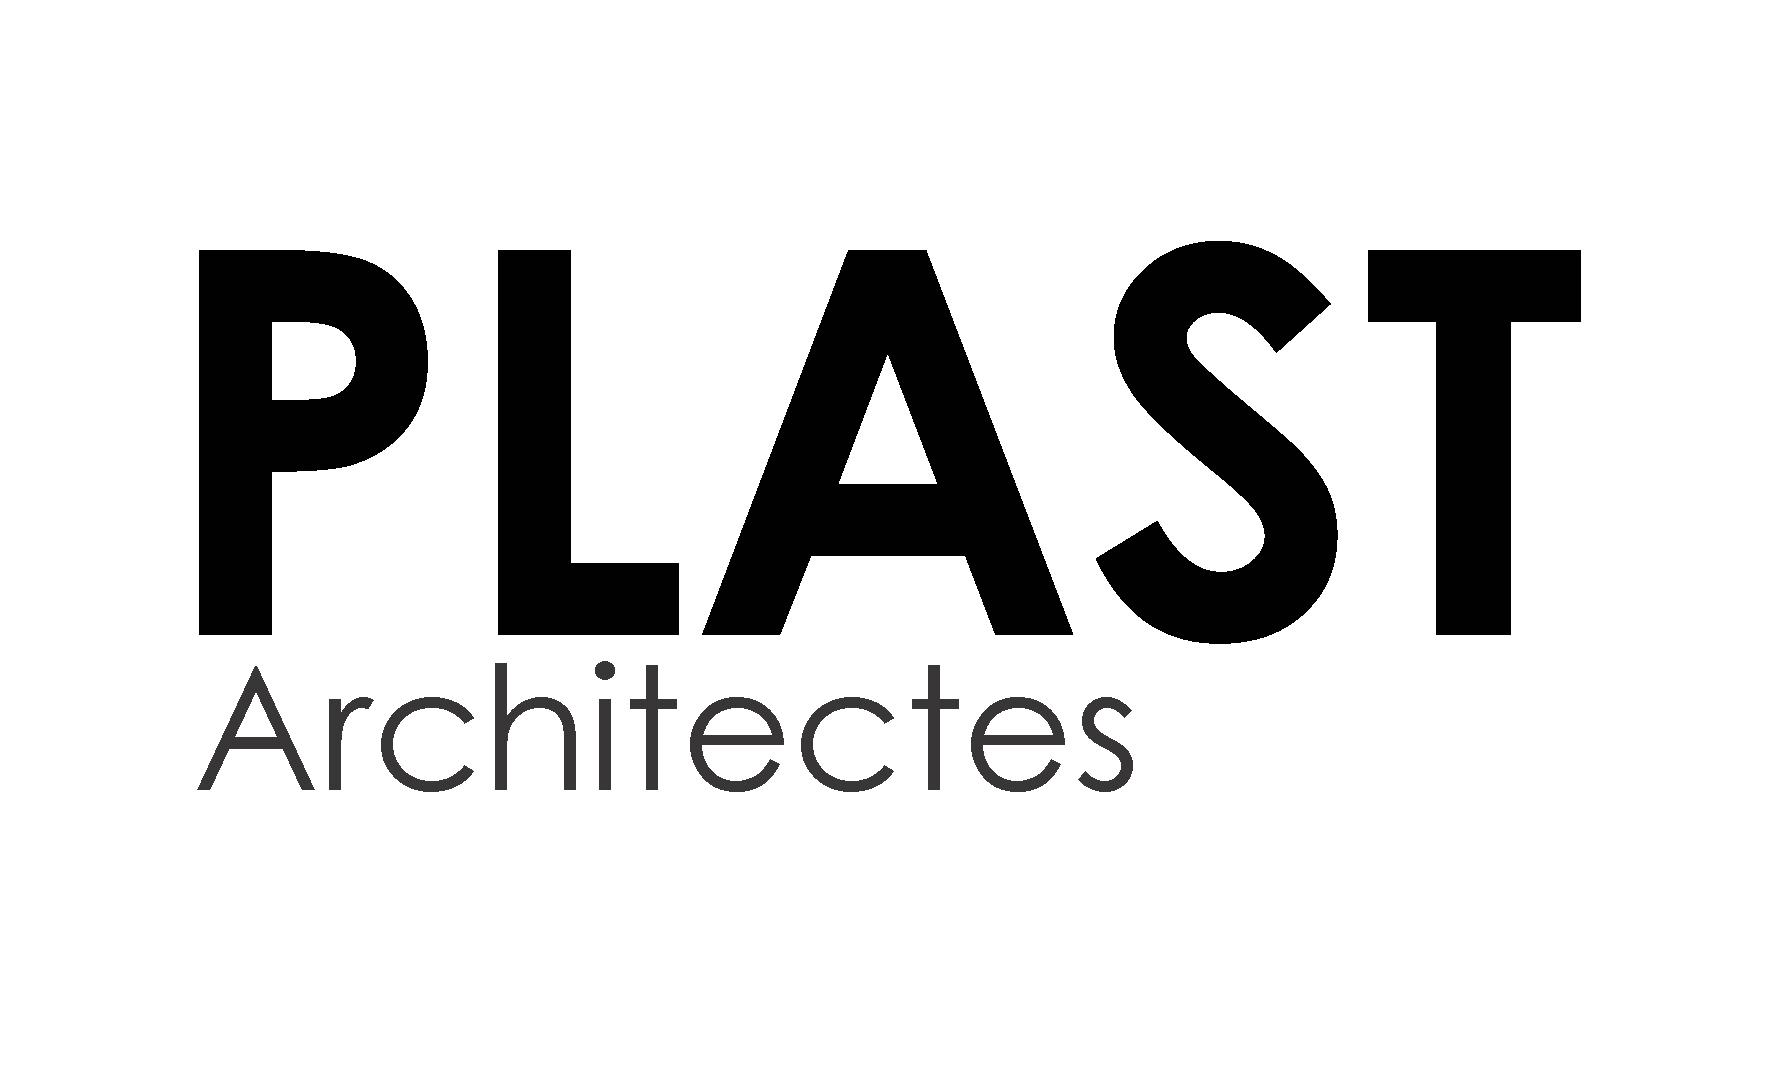 plast architectes ordre des architectes. Black Bedroom Furniture Sets. Home Design Ideas